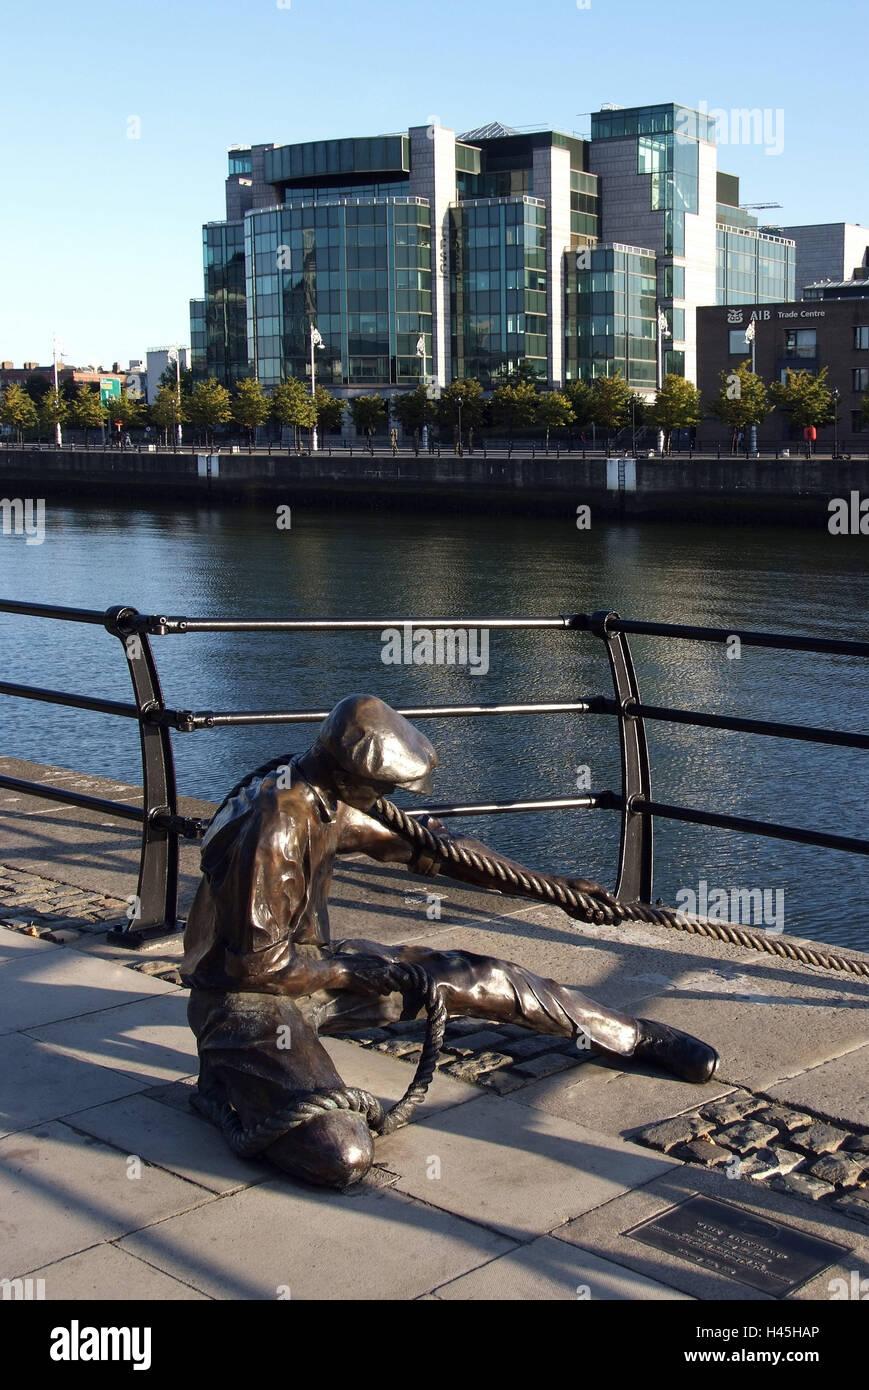 Ireland, Dublin, Docklands, City Quay, statue, The Linesman, River Liffey, - Stock Image